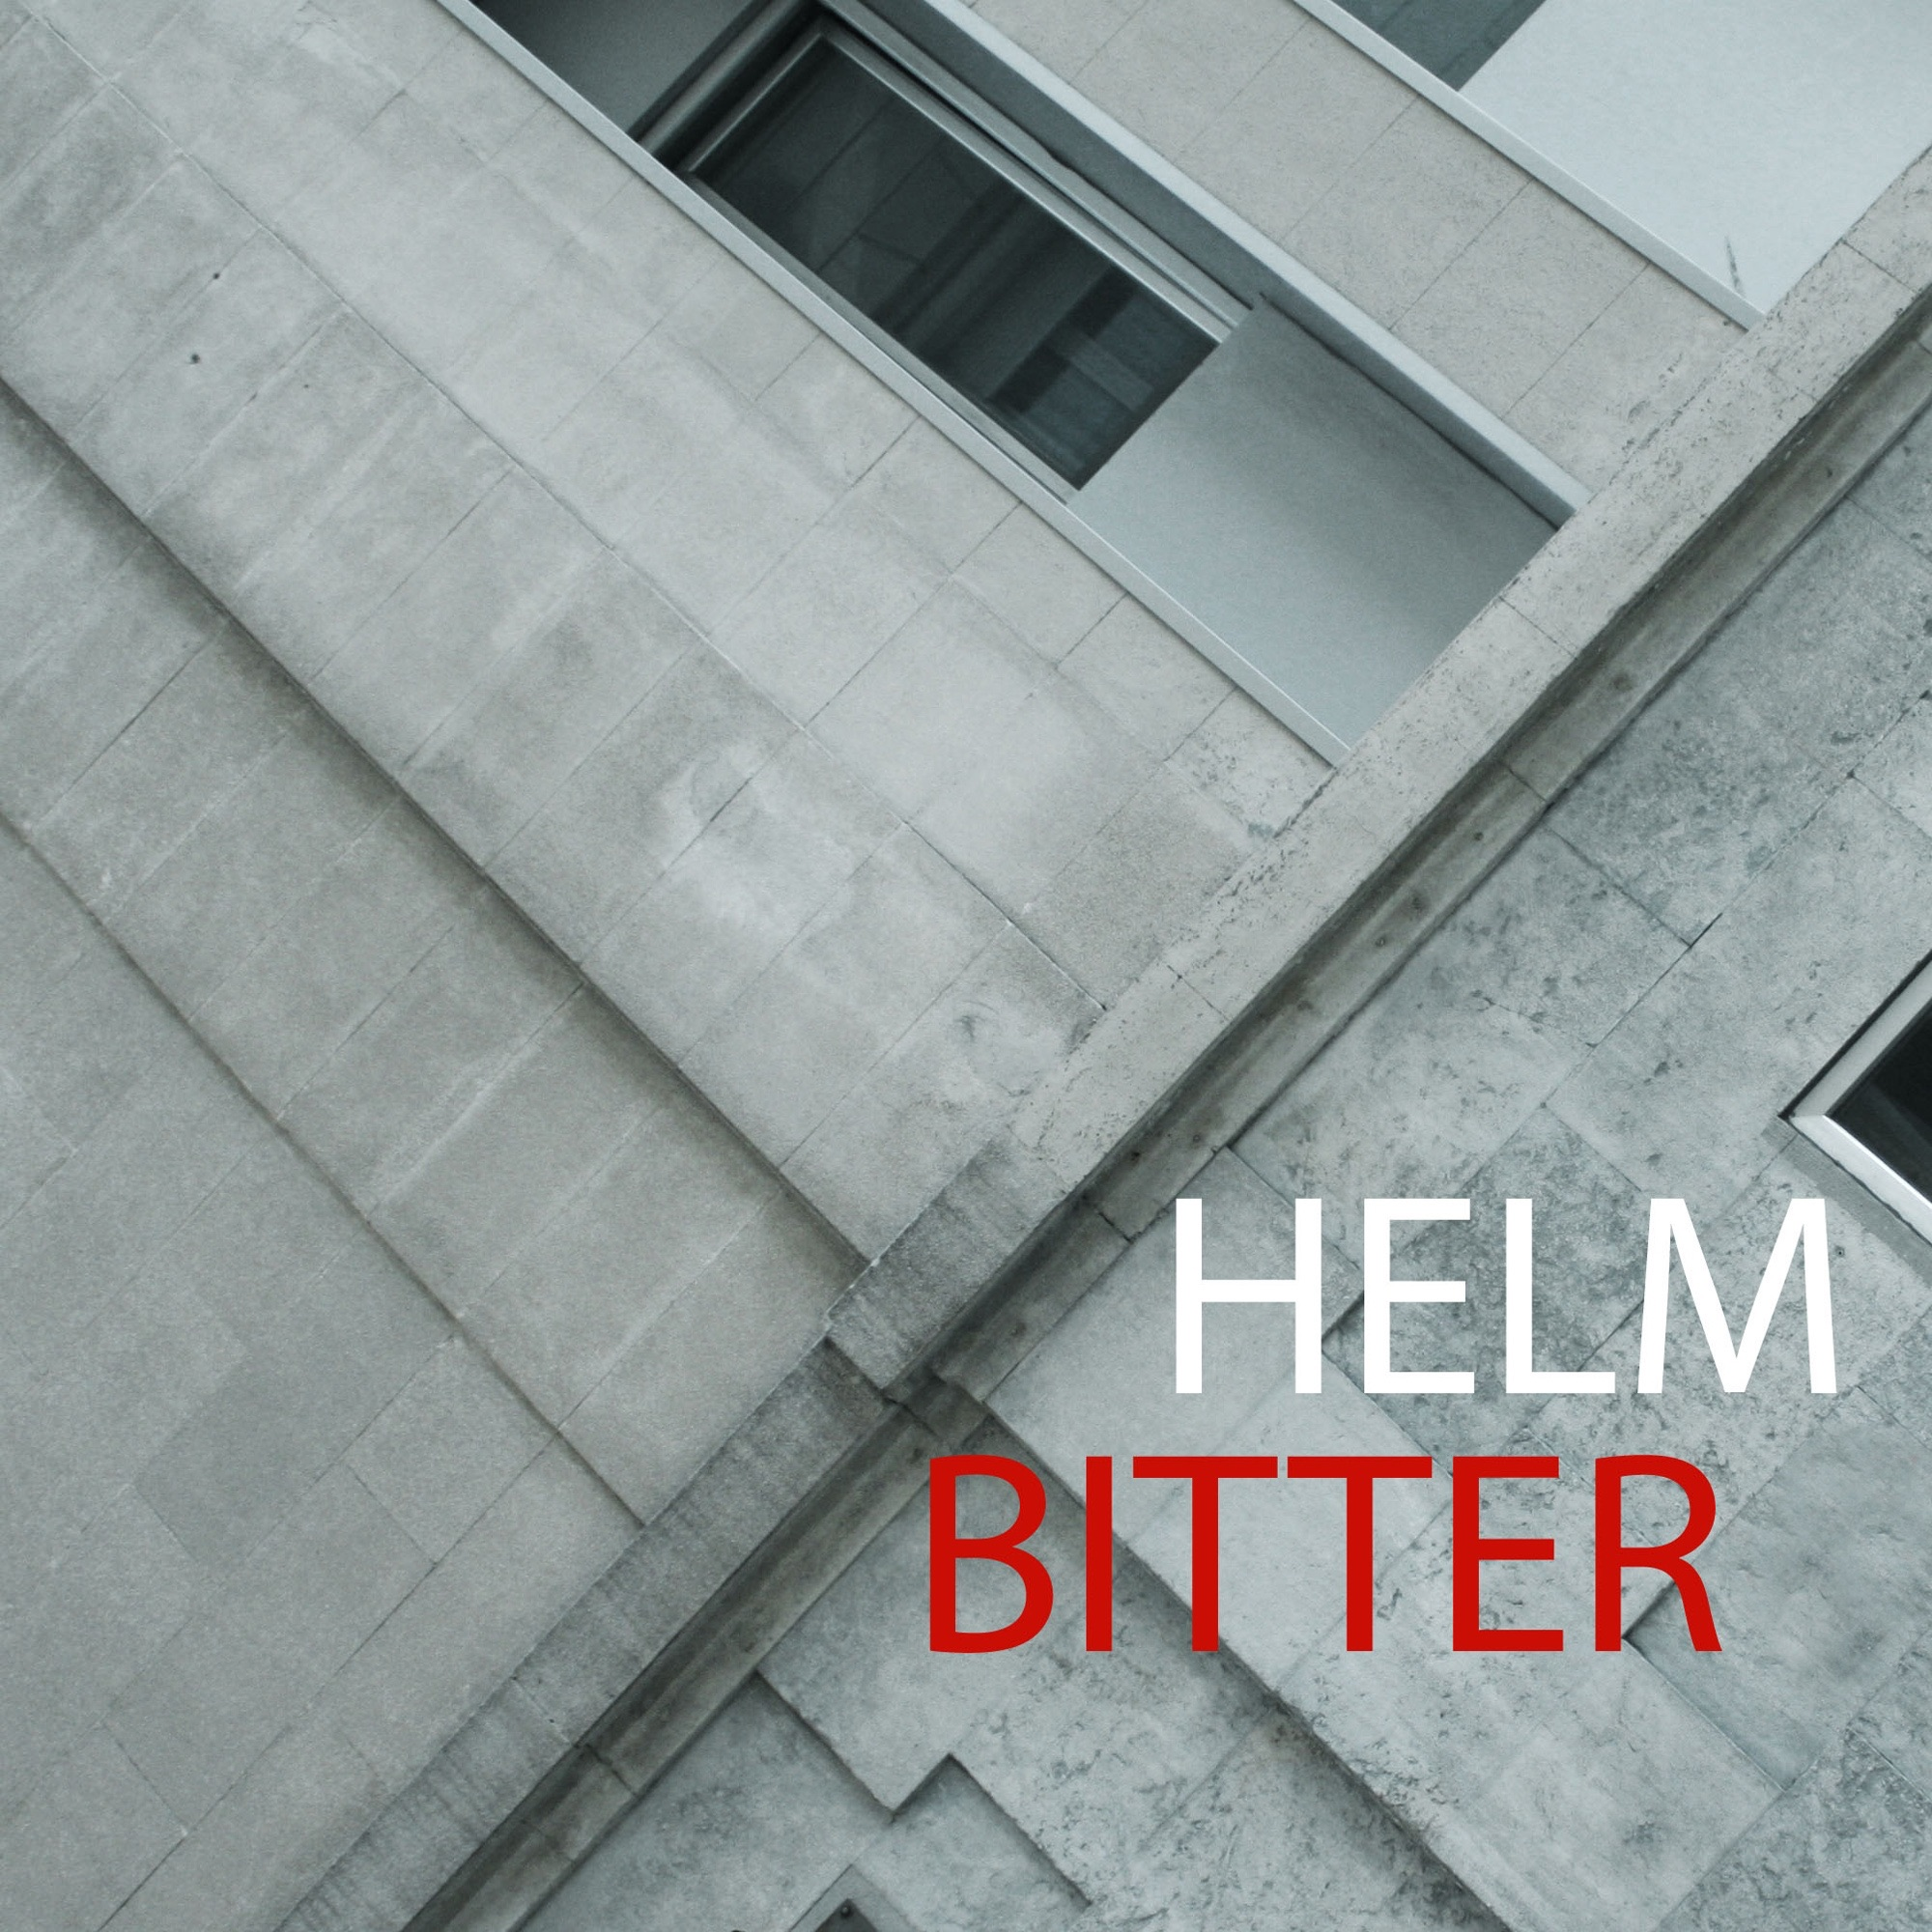 BItter (Parralox Remix)